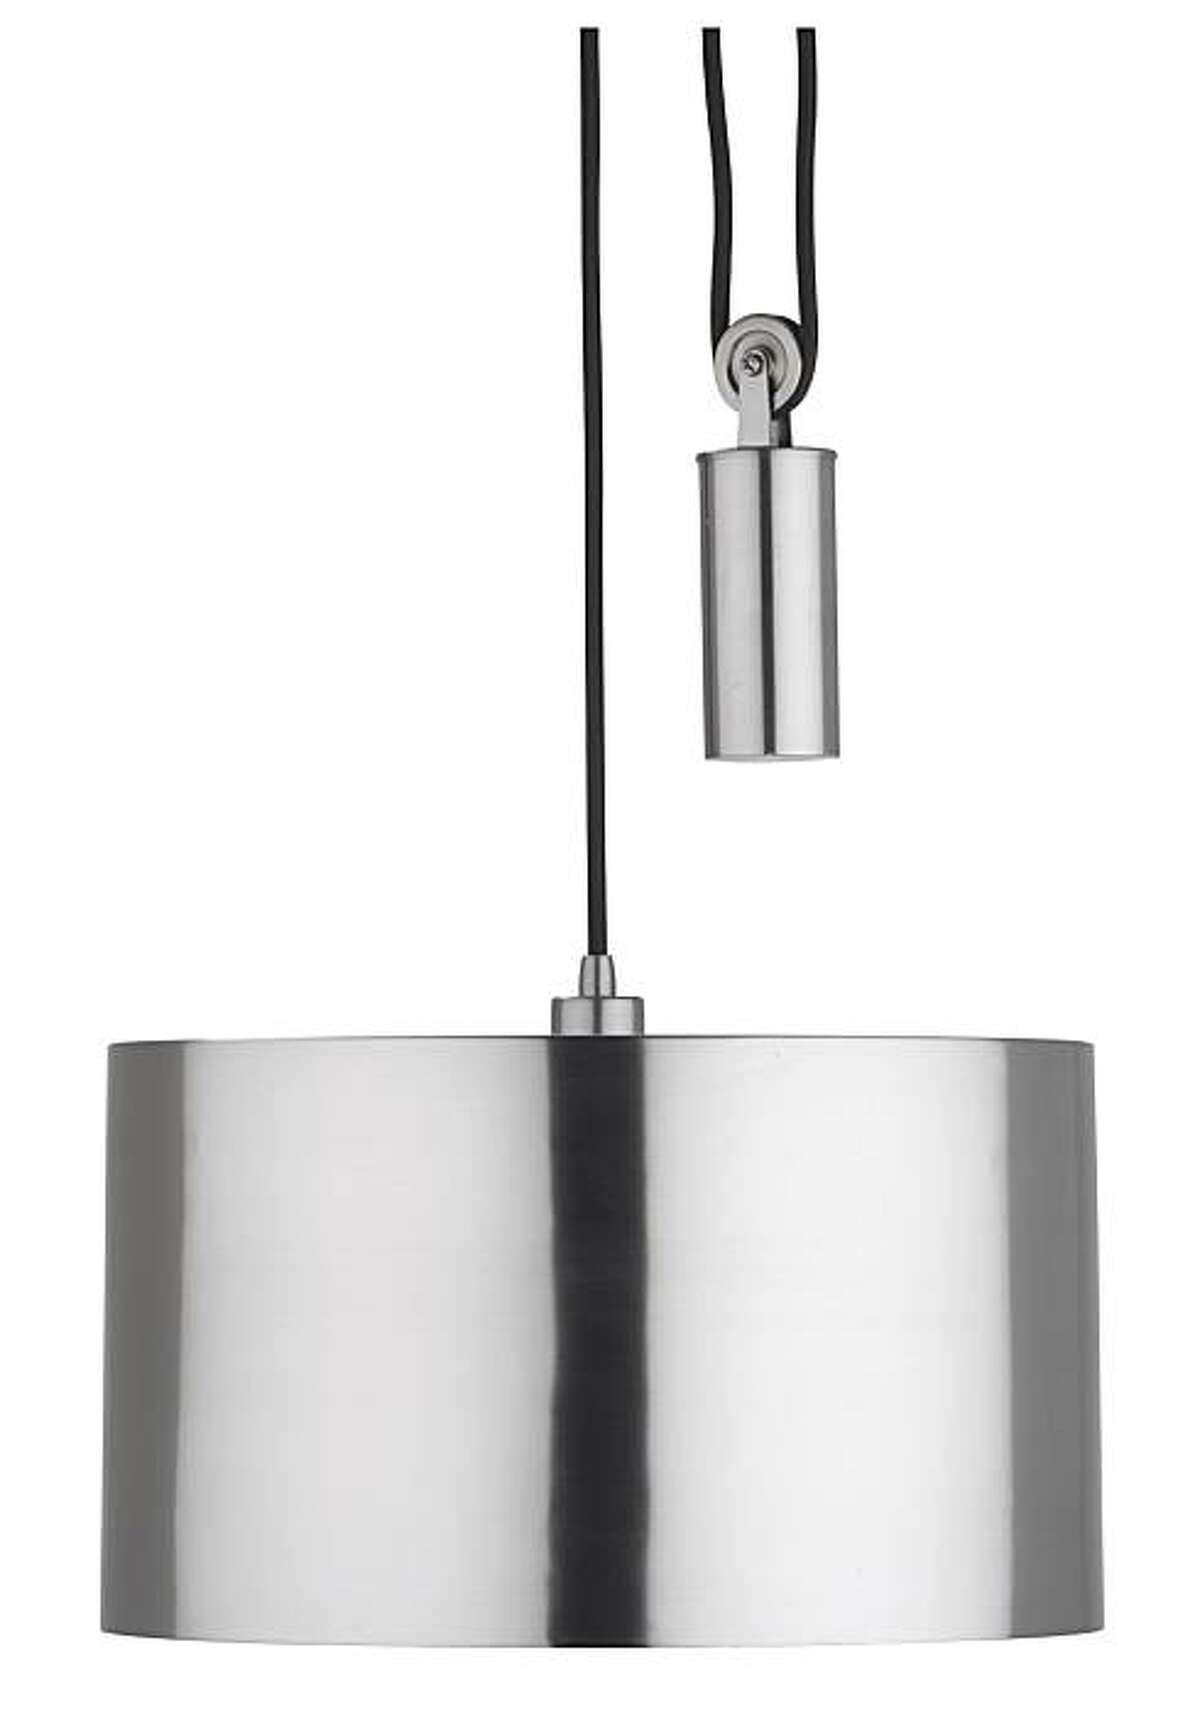 CB2's Pulley Pendant lamp